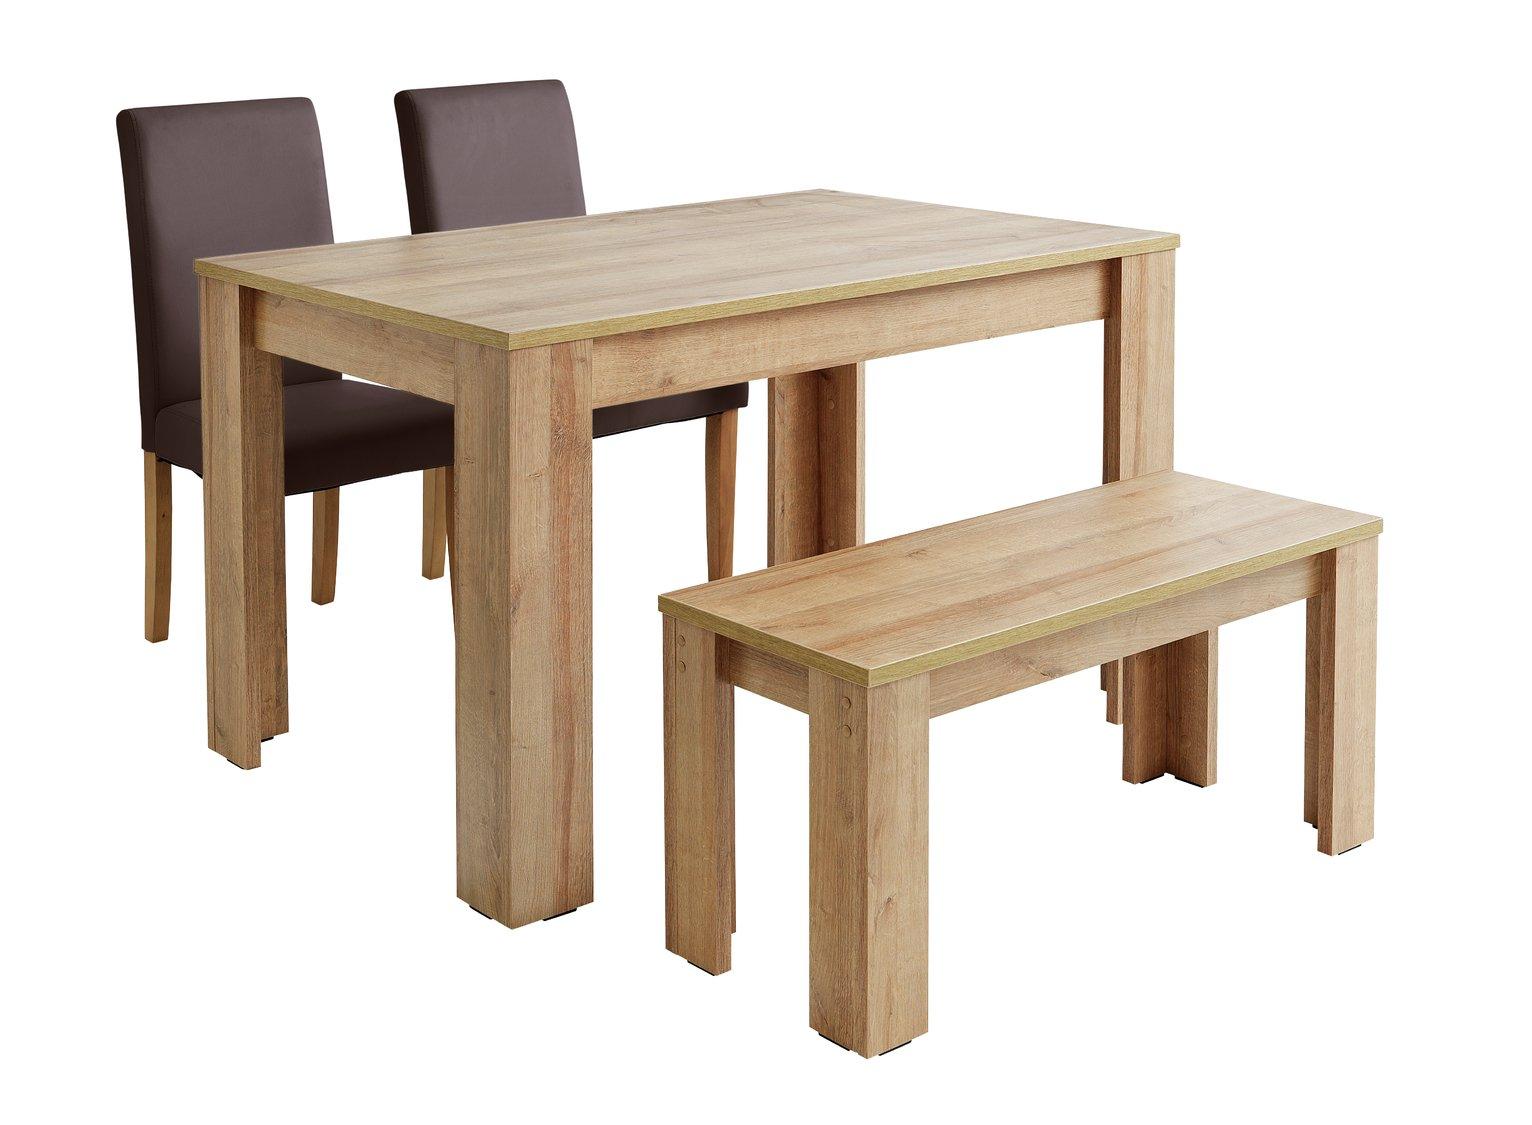 Argos Home Miami Oak Effect Table, Bench & 2 Chocolate Chair